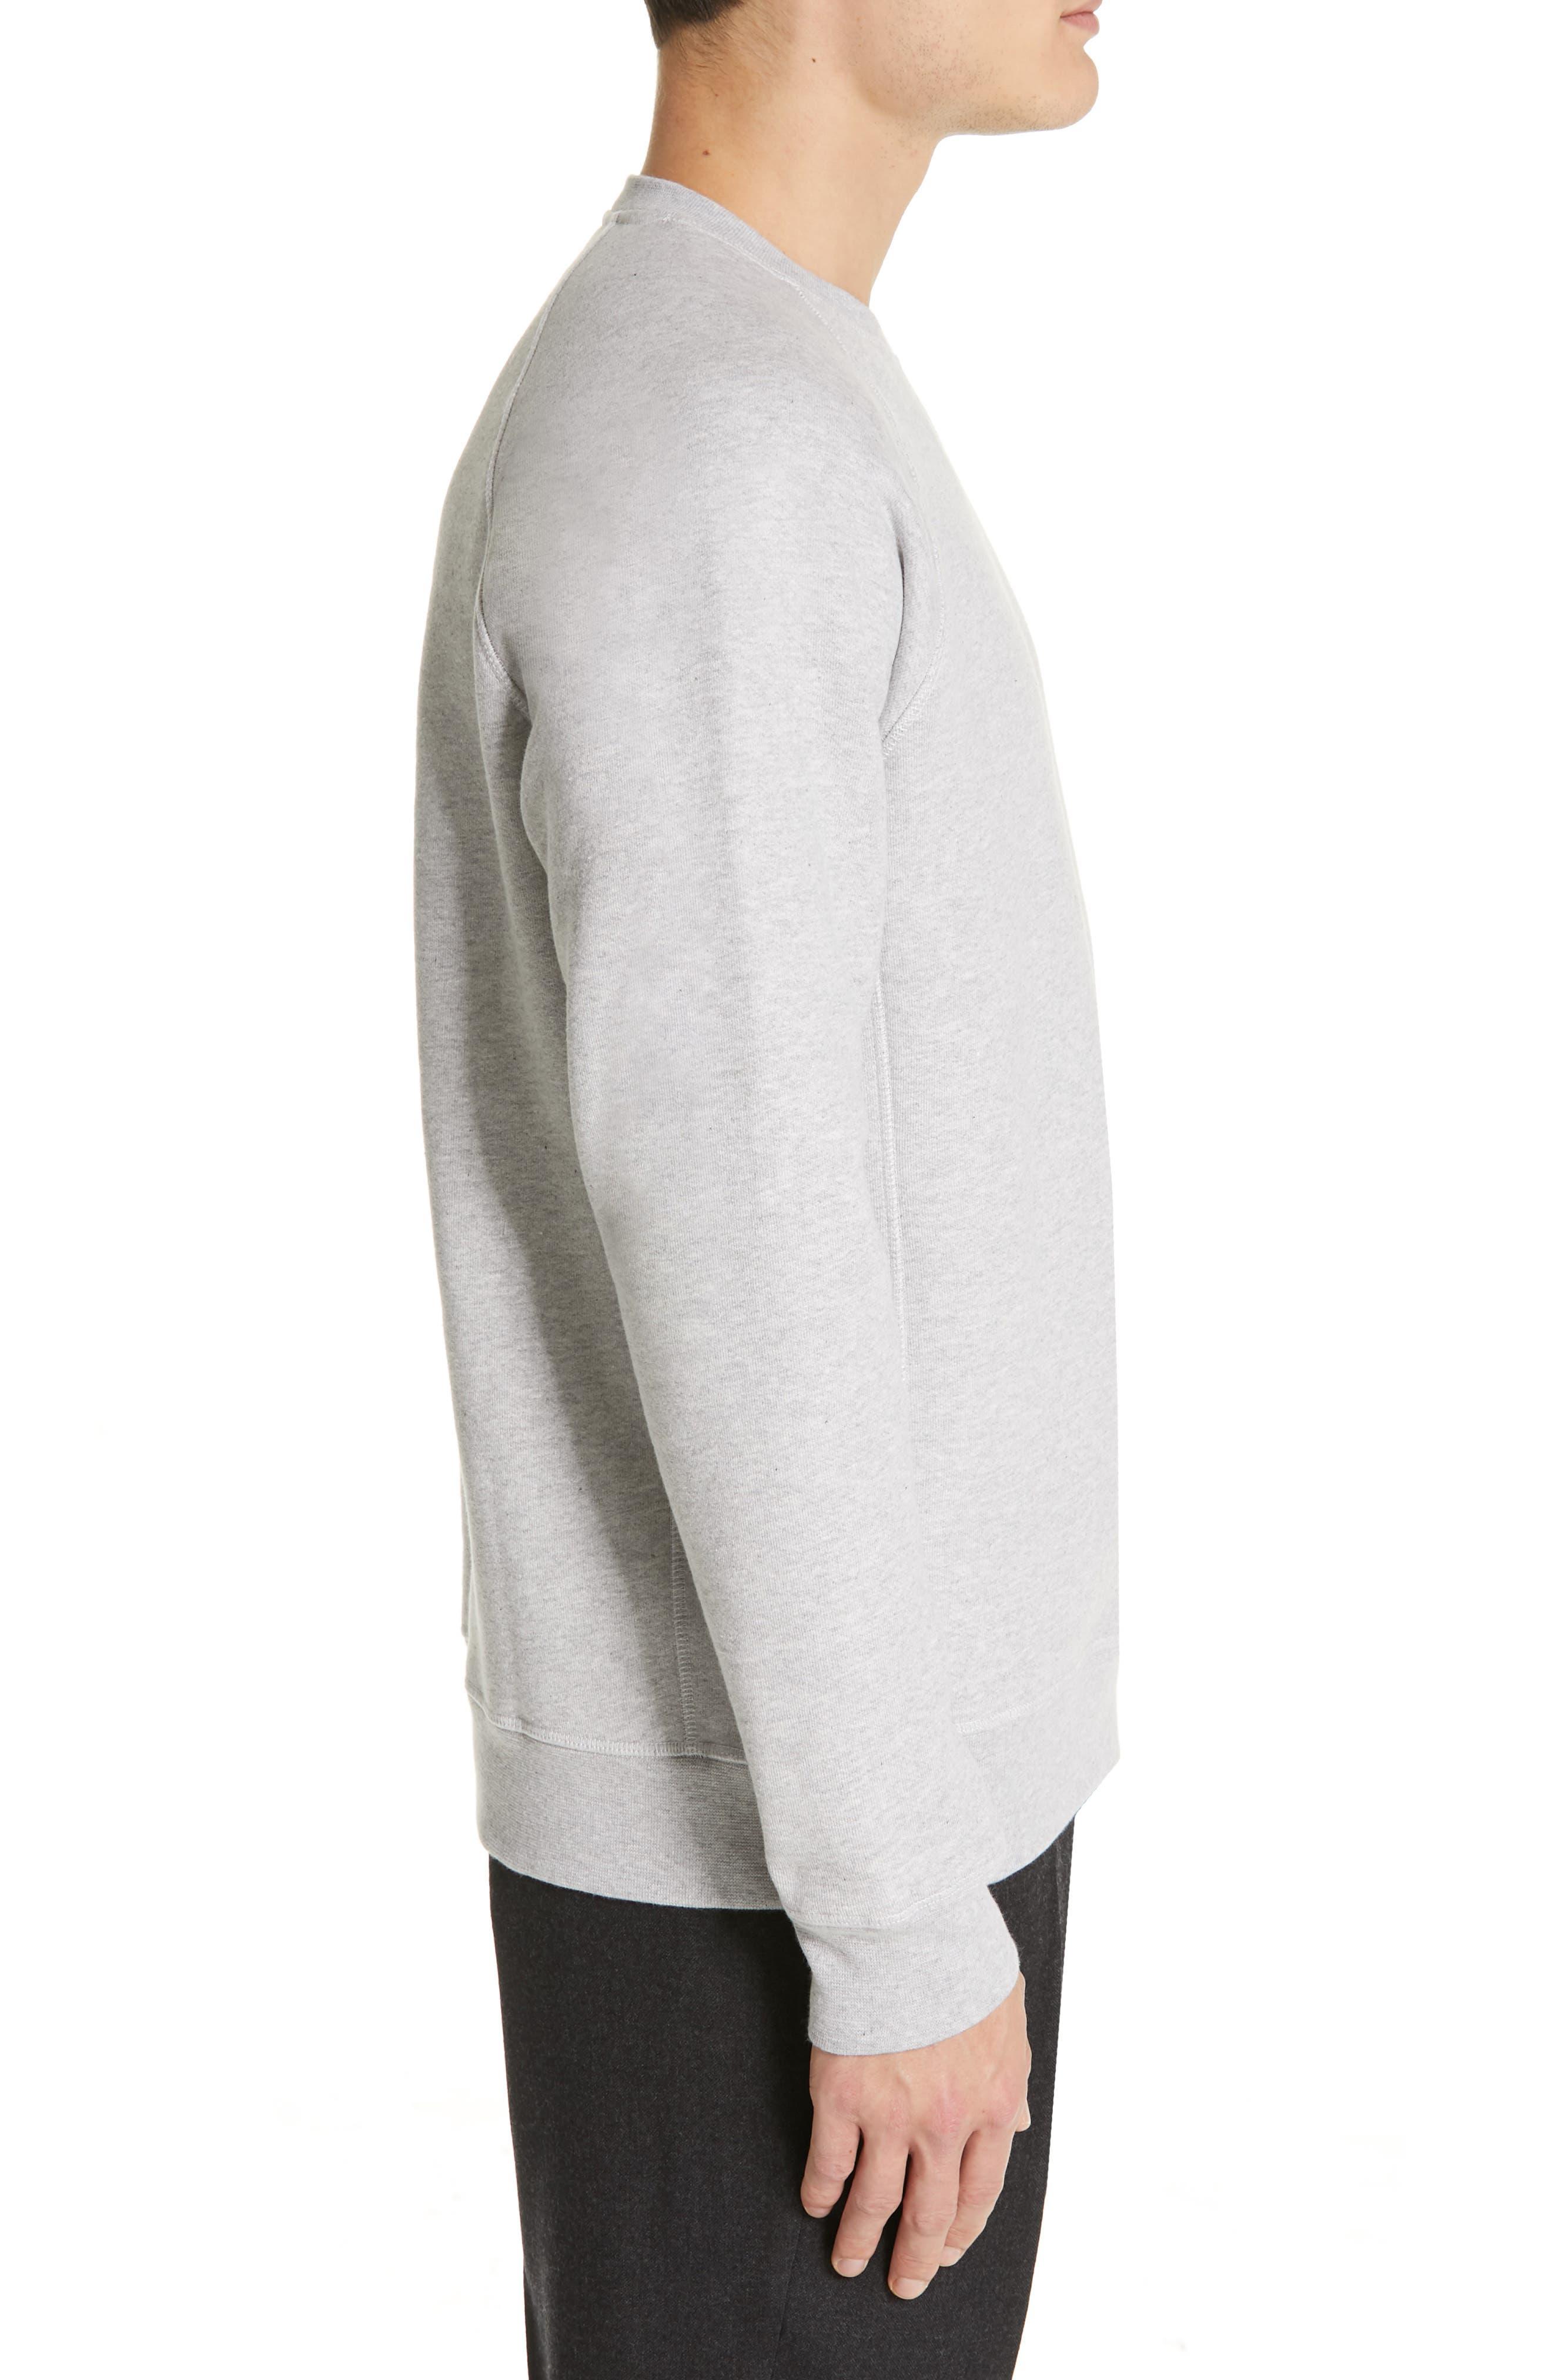 NORSE PROJECTS, Ketel Raglan Sweatshirt, Alternate thumbnail 3, color, LIGHT GREY MELANGE